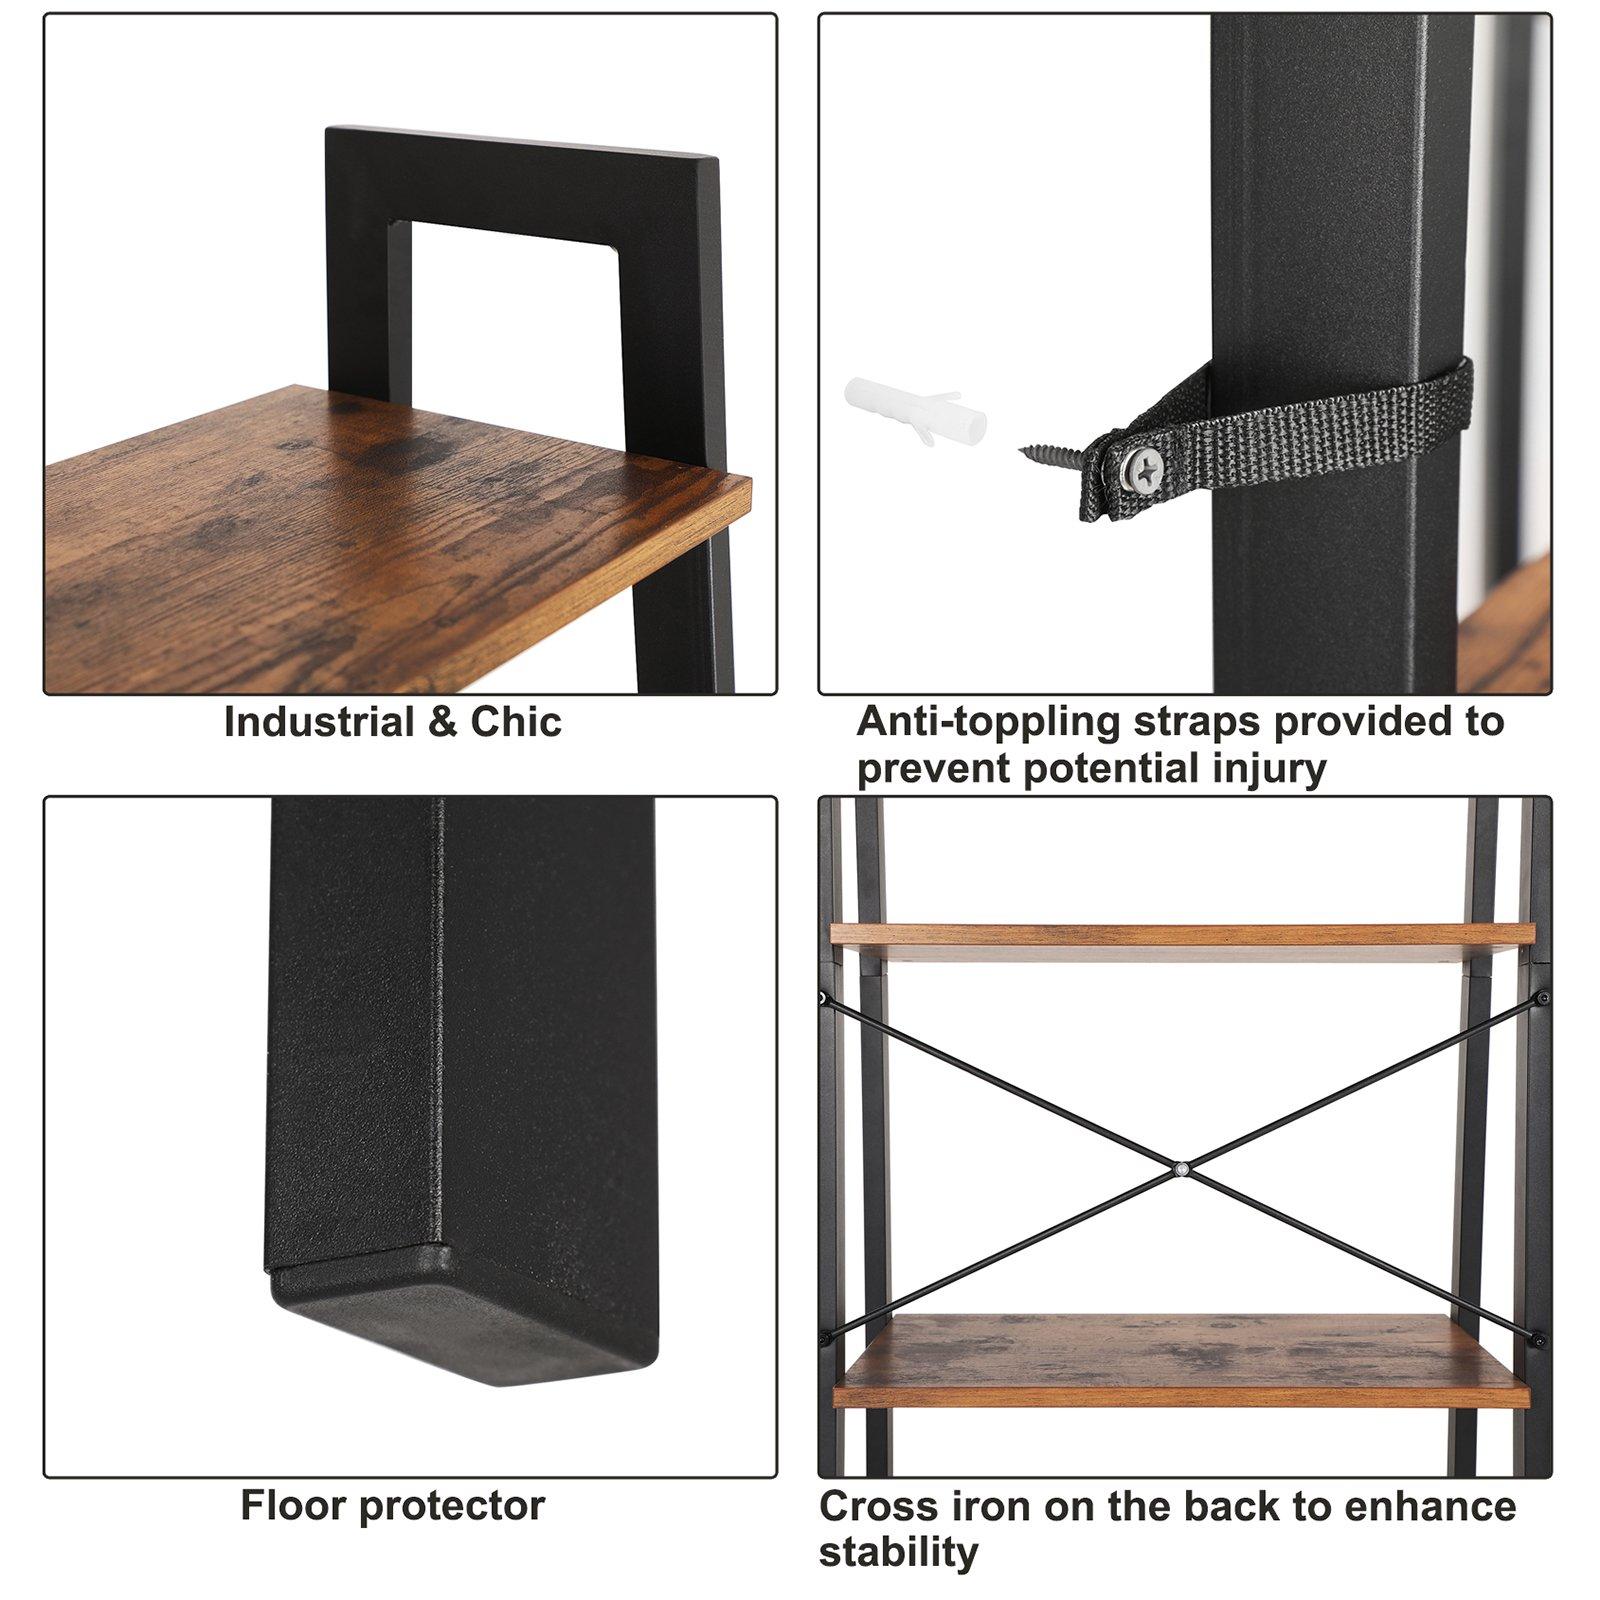 SONGMICS Vintage Ladder Shelf 4 Tier Bookcase Plant Stand Storage Garden Bathroom Living Room Wood Look Accent Furniture Metal Frame ULLS44X